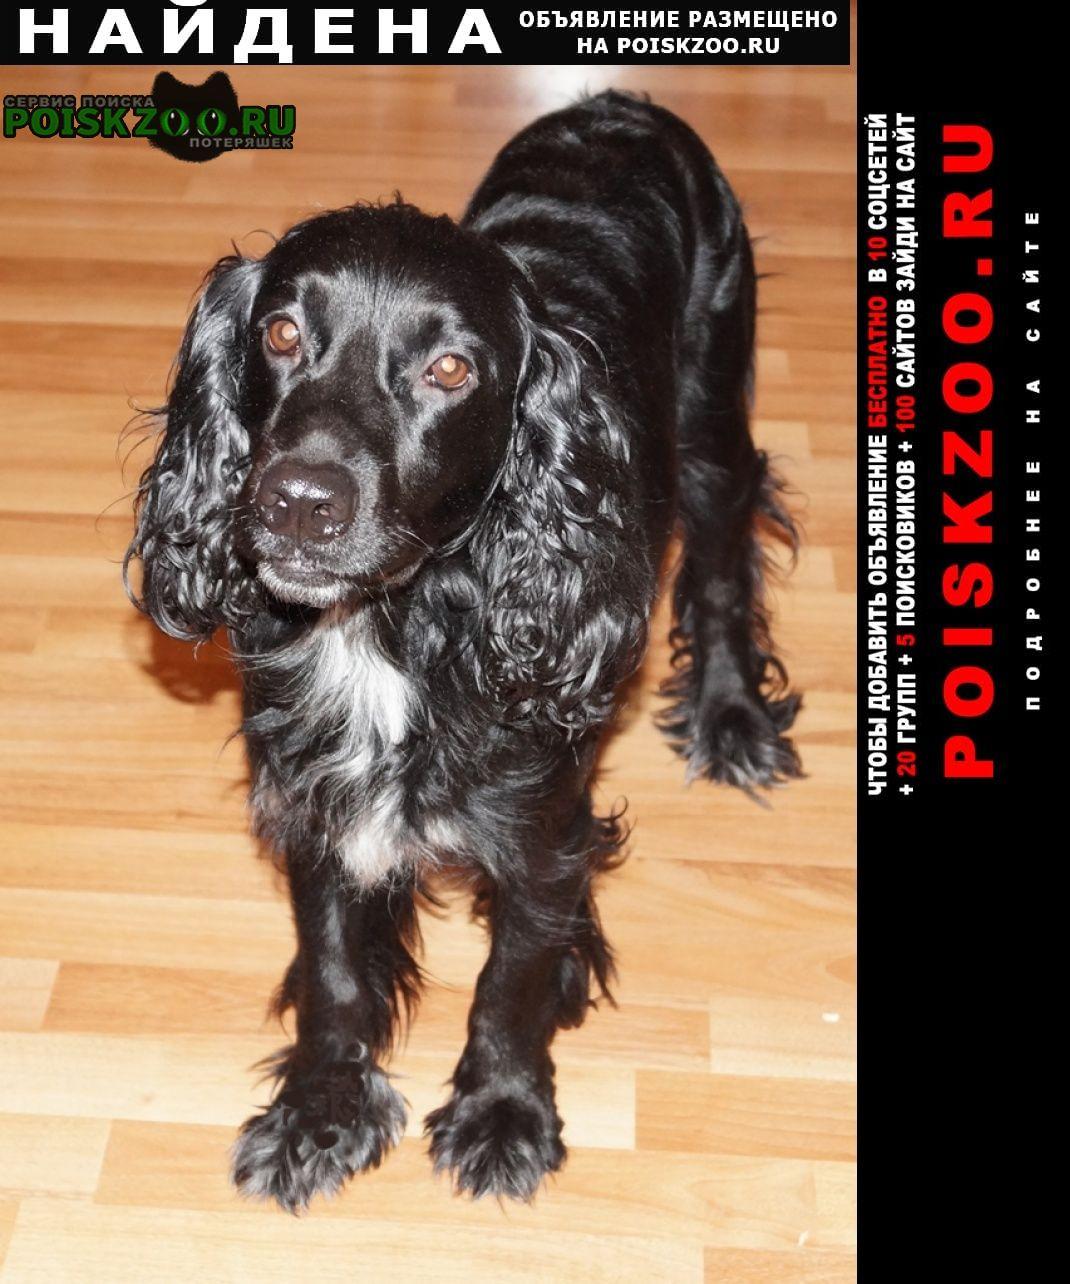 Найдена собака мальчик, кокер спаниель Самара